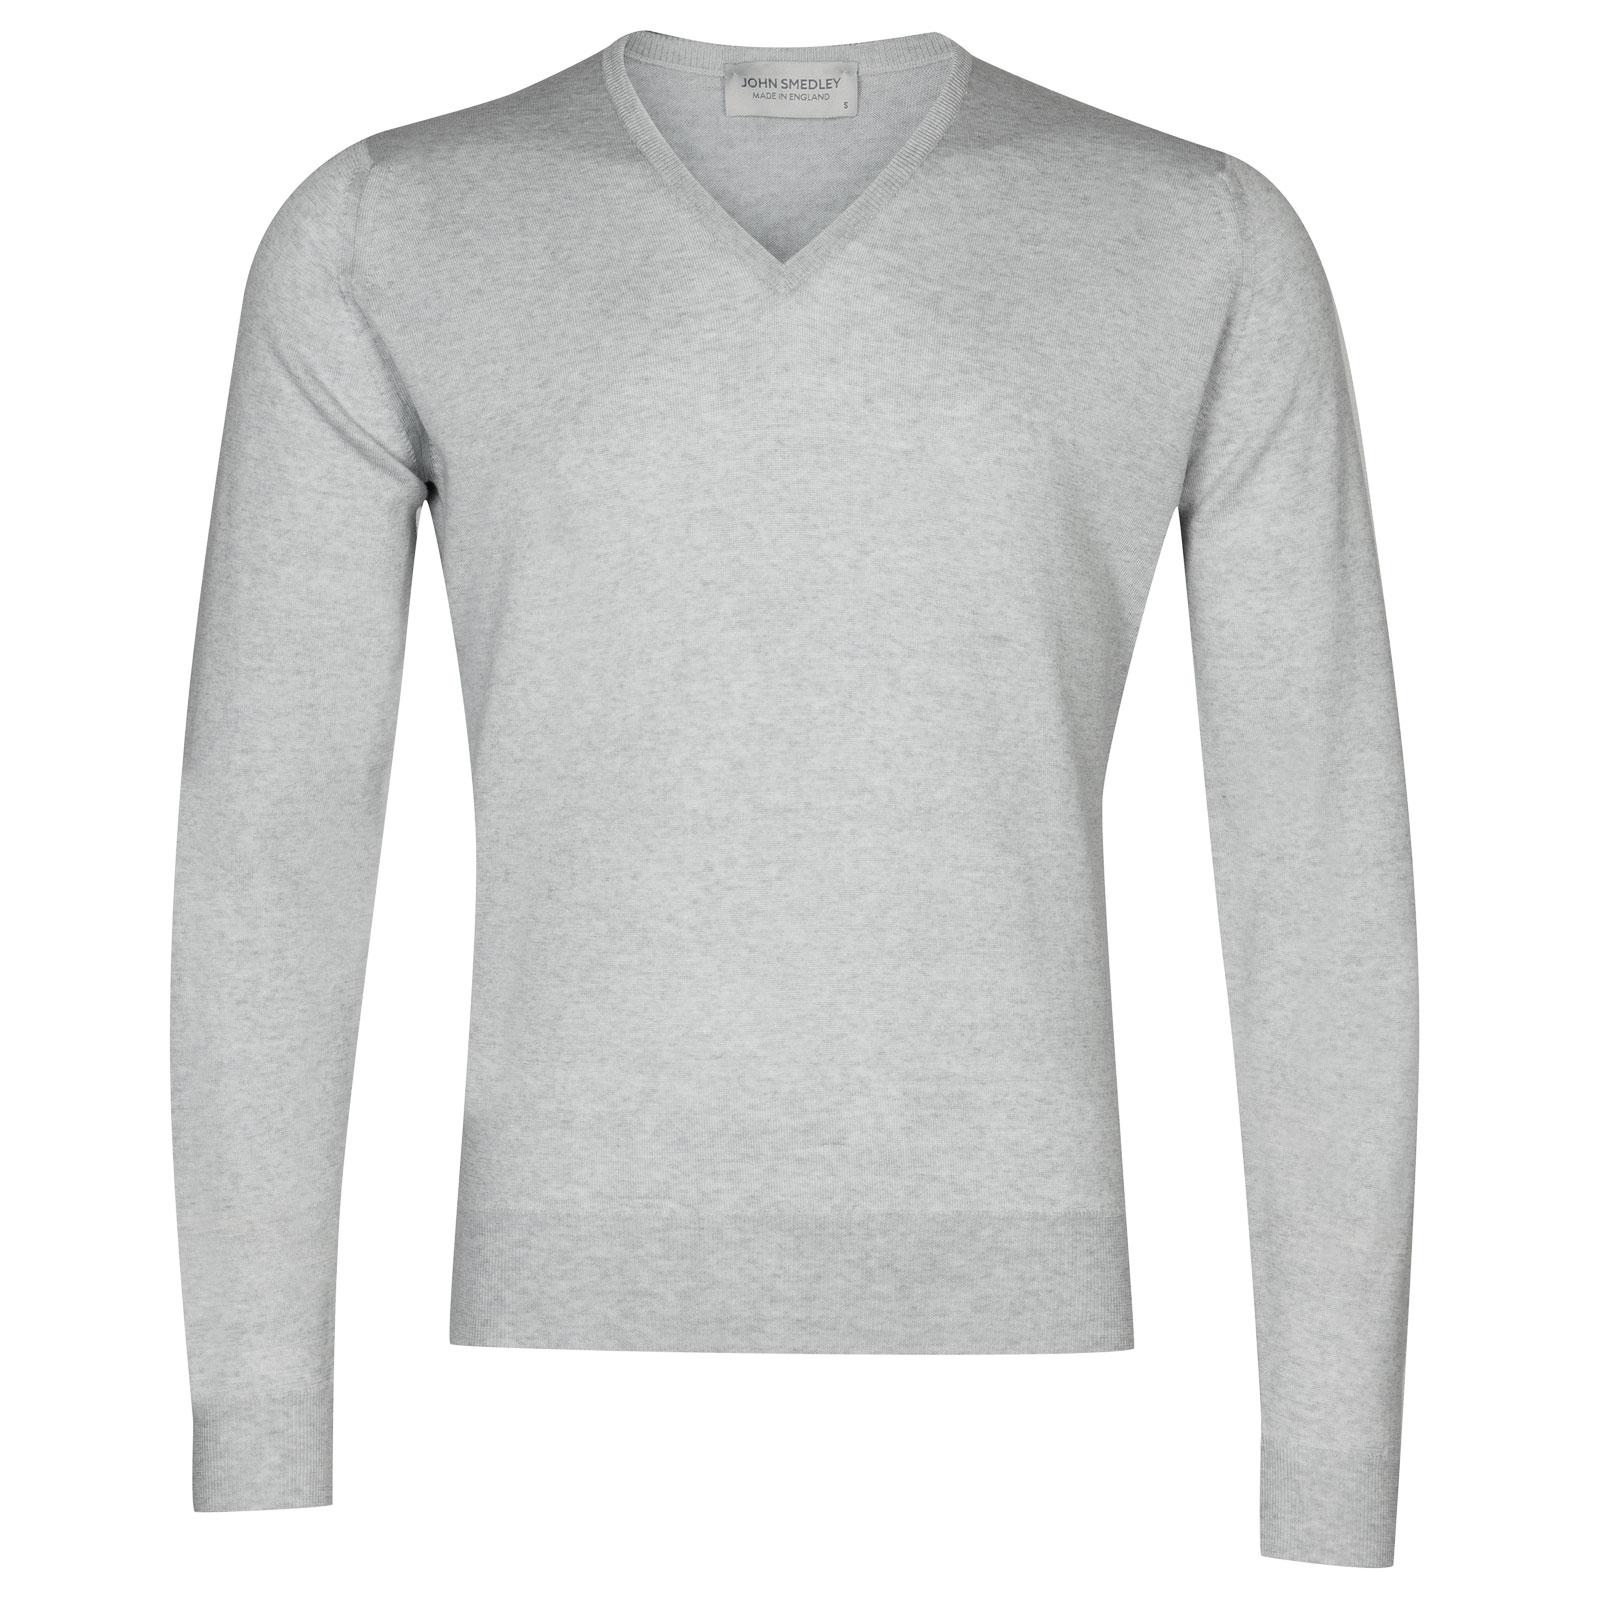 John Smedley Lugano Merino Wool Pullover in Bardot Grey-XL